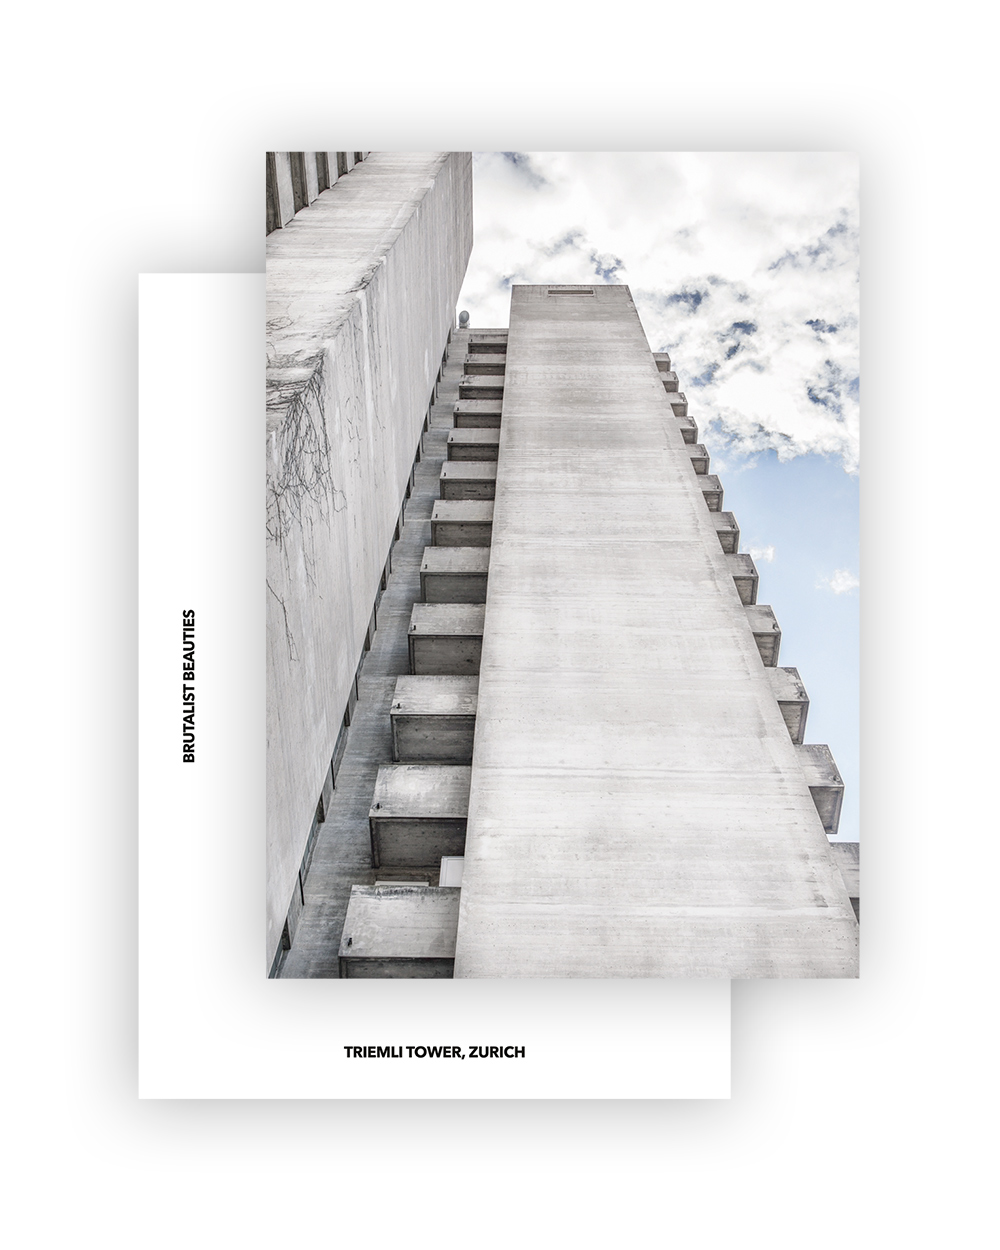 TRIEMLI TOWER I ESTHER & RUDOLF GUYER I BRUTALIST BEAUTIES POSTCARD A6 I © HEARTBRUT/KARIN HUNTER BÜRKI